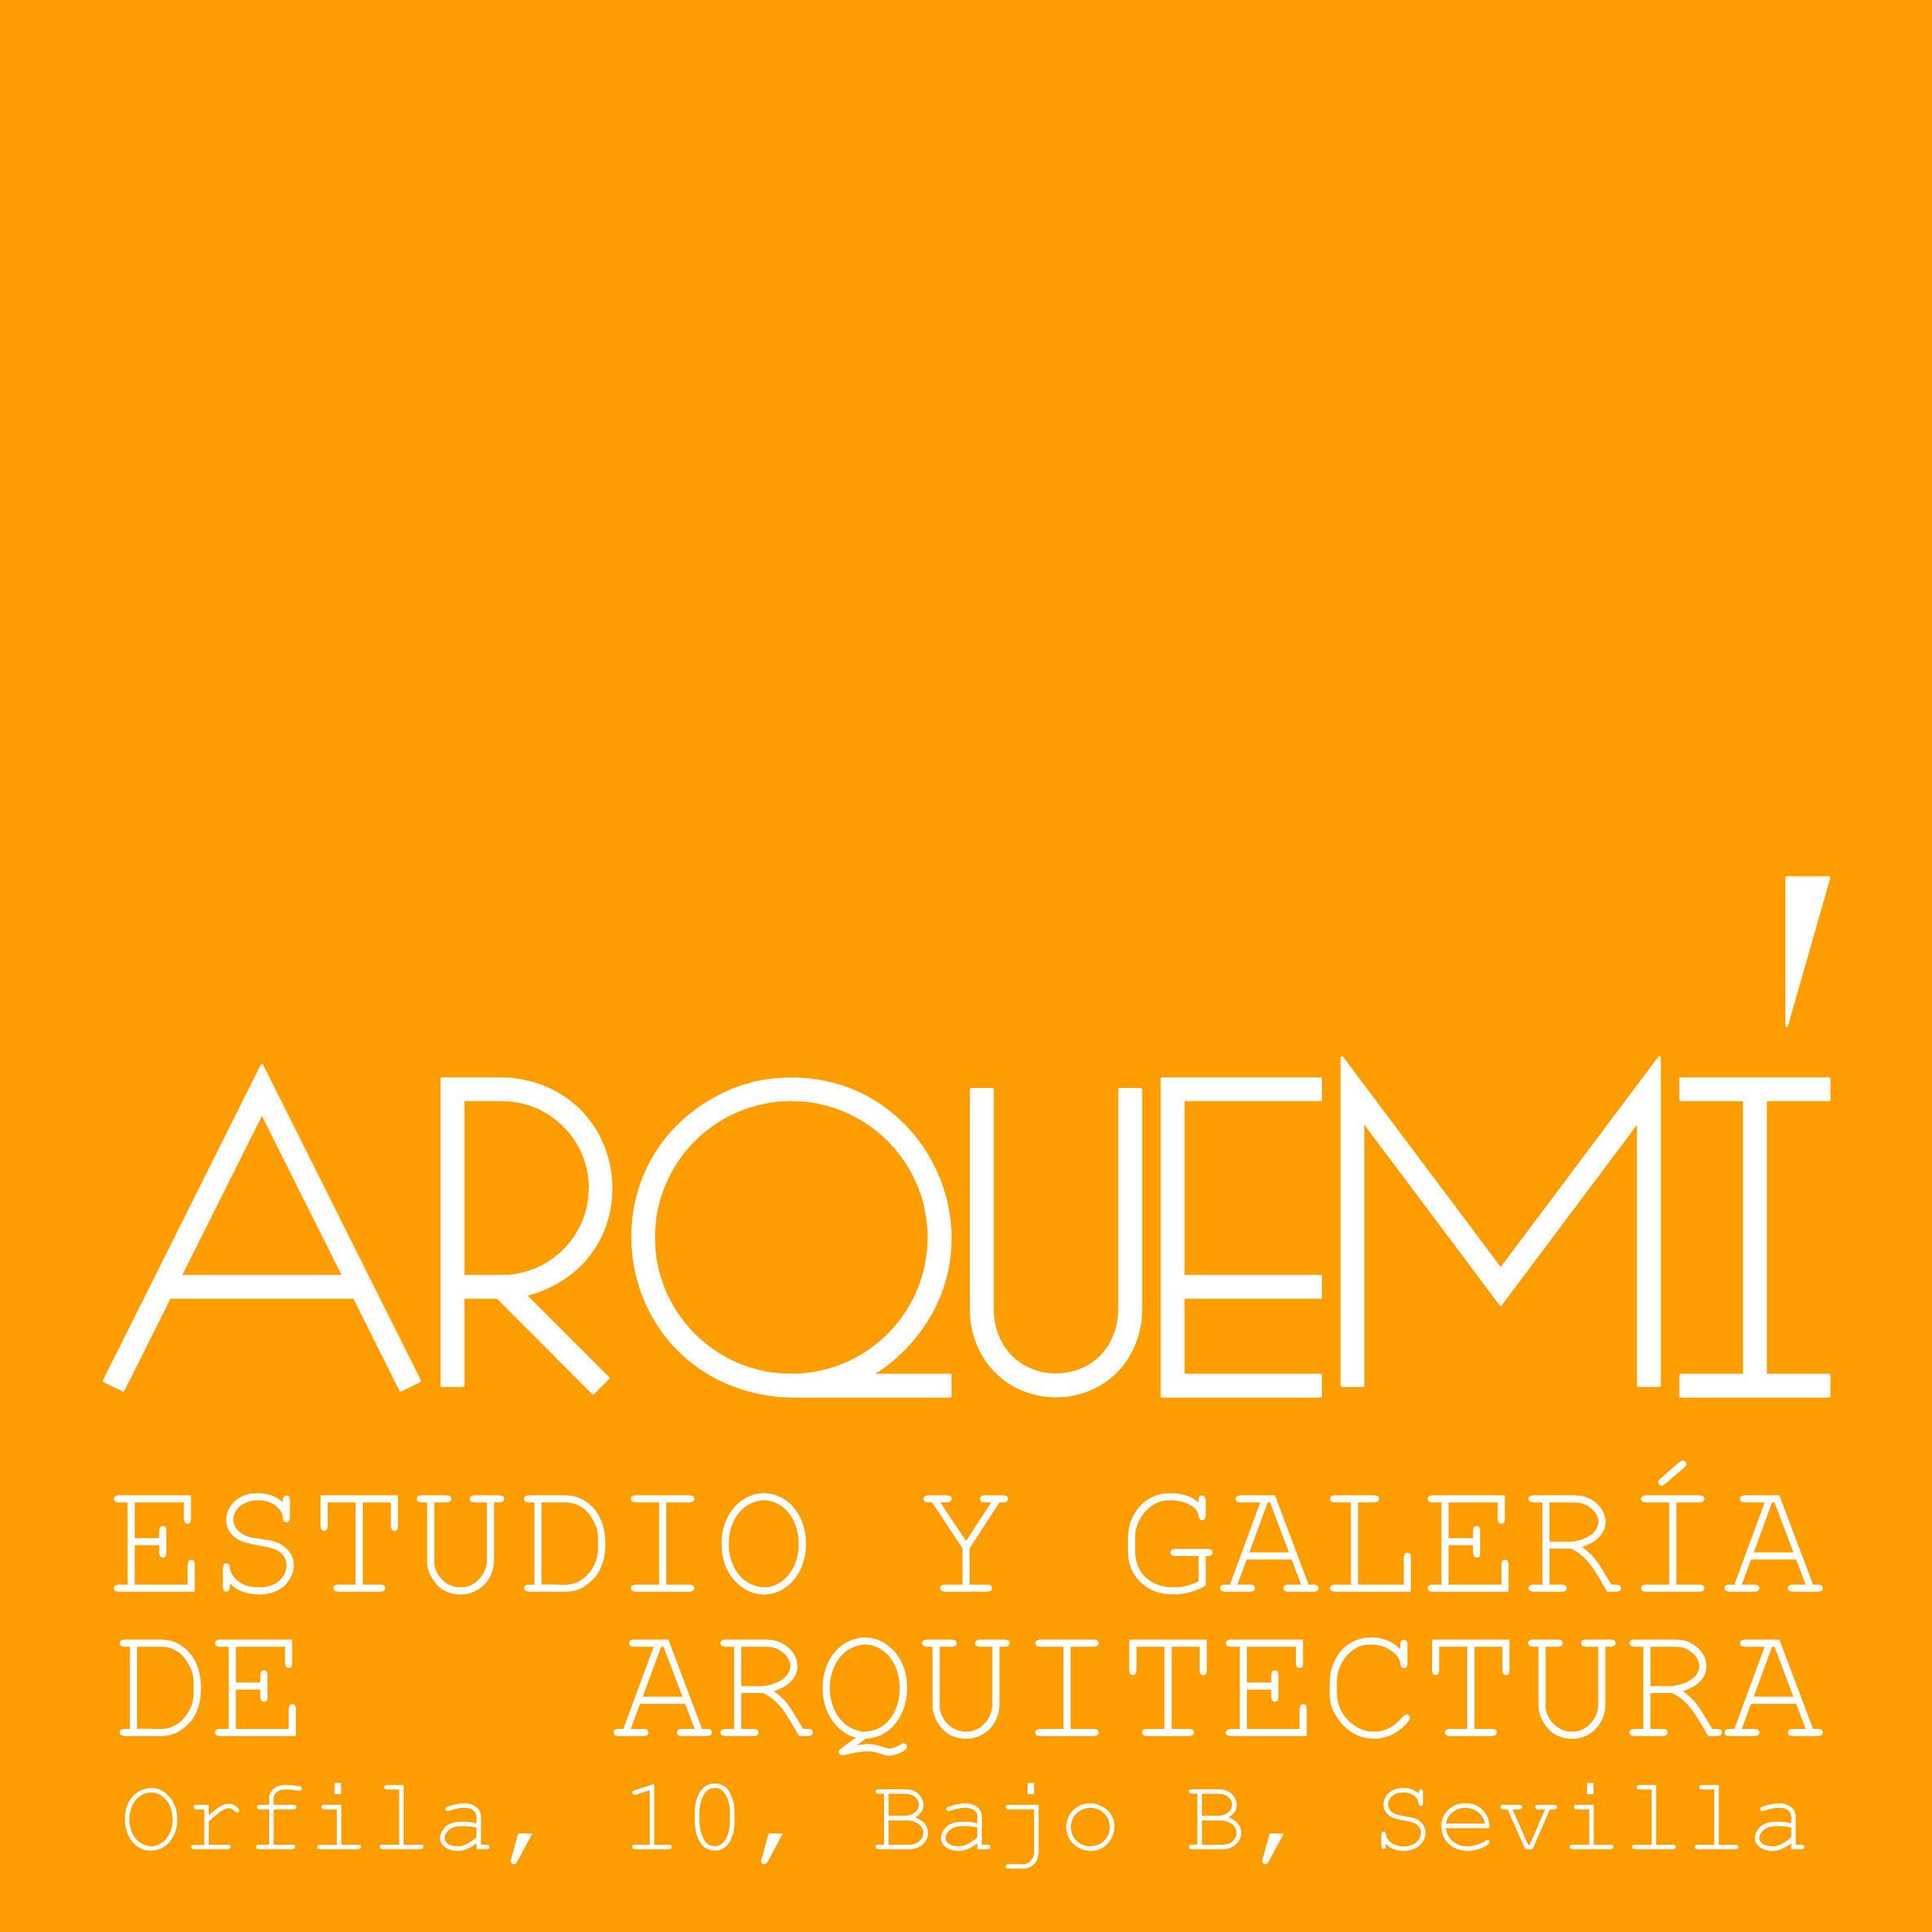 Arquem estudio y galer a de arquitectura sevilla - Estudio de arquitectura sevilla ...